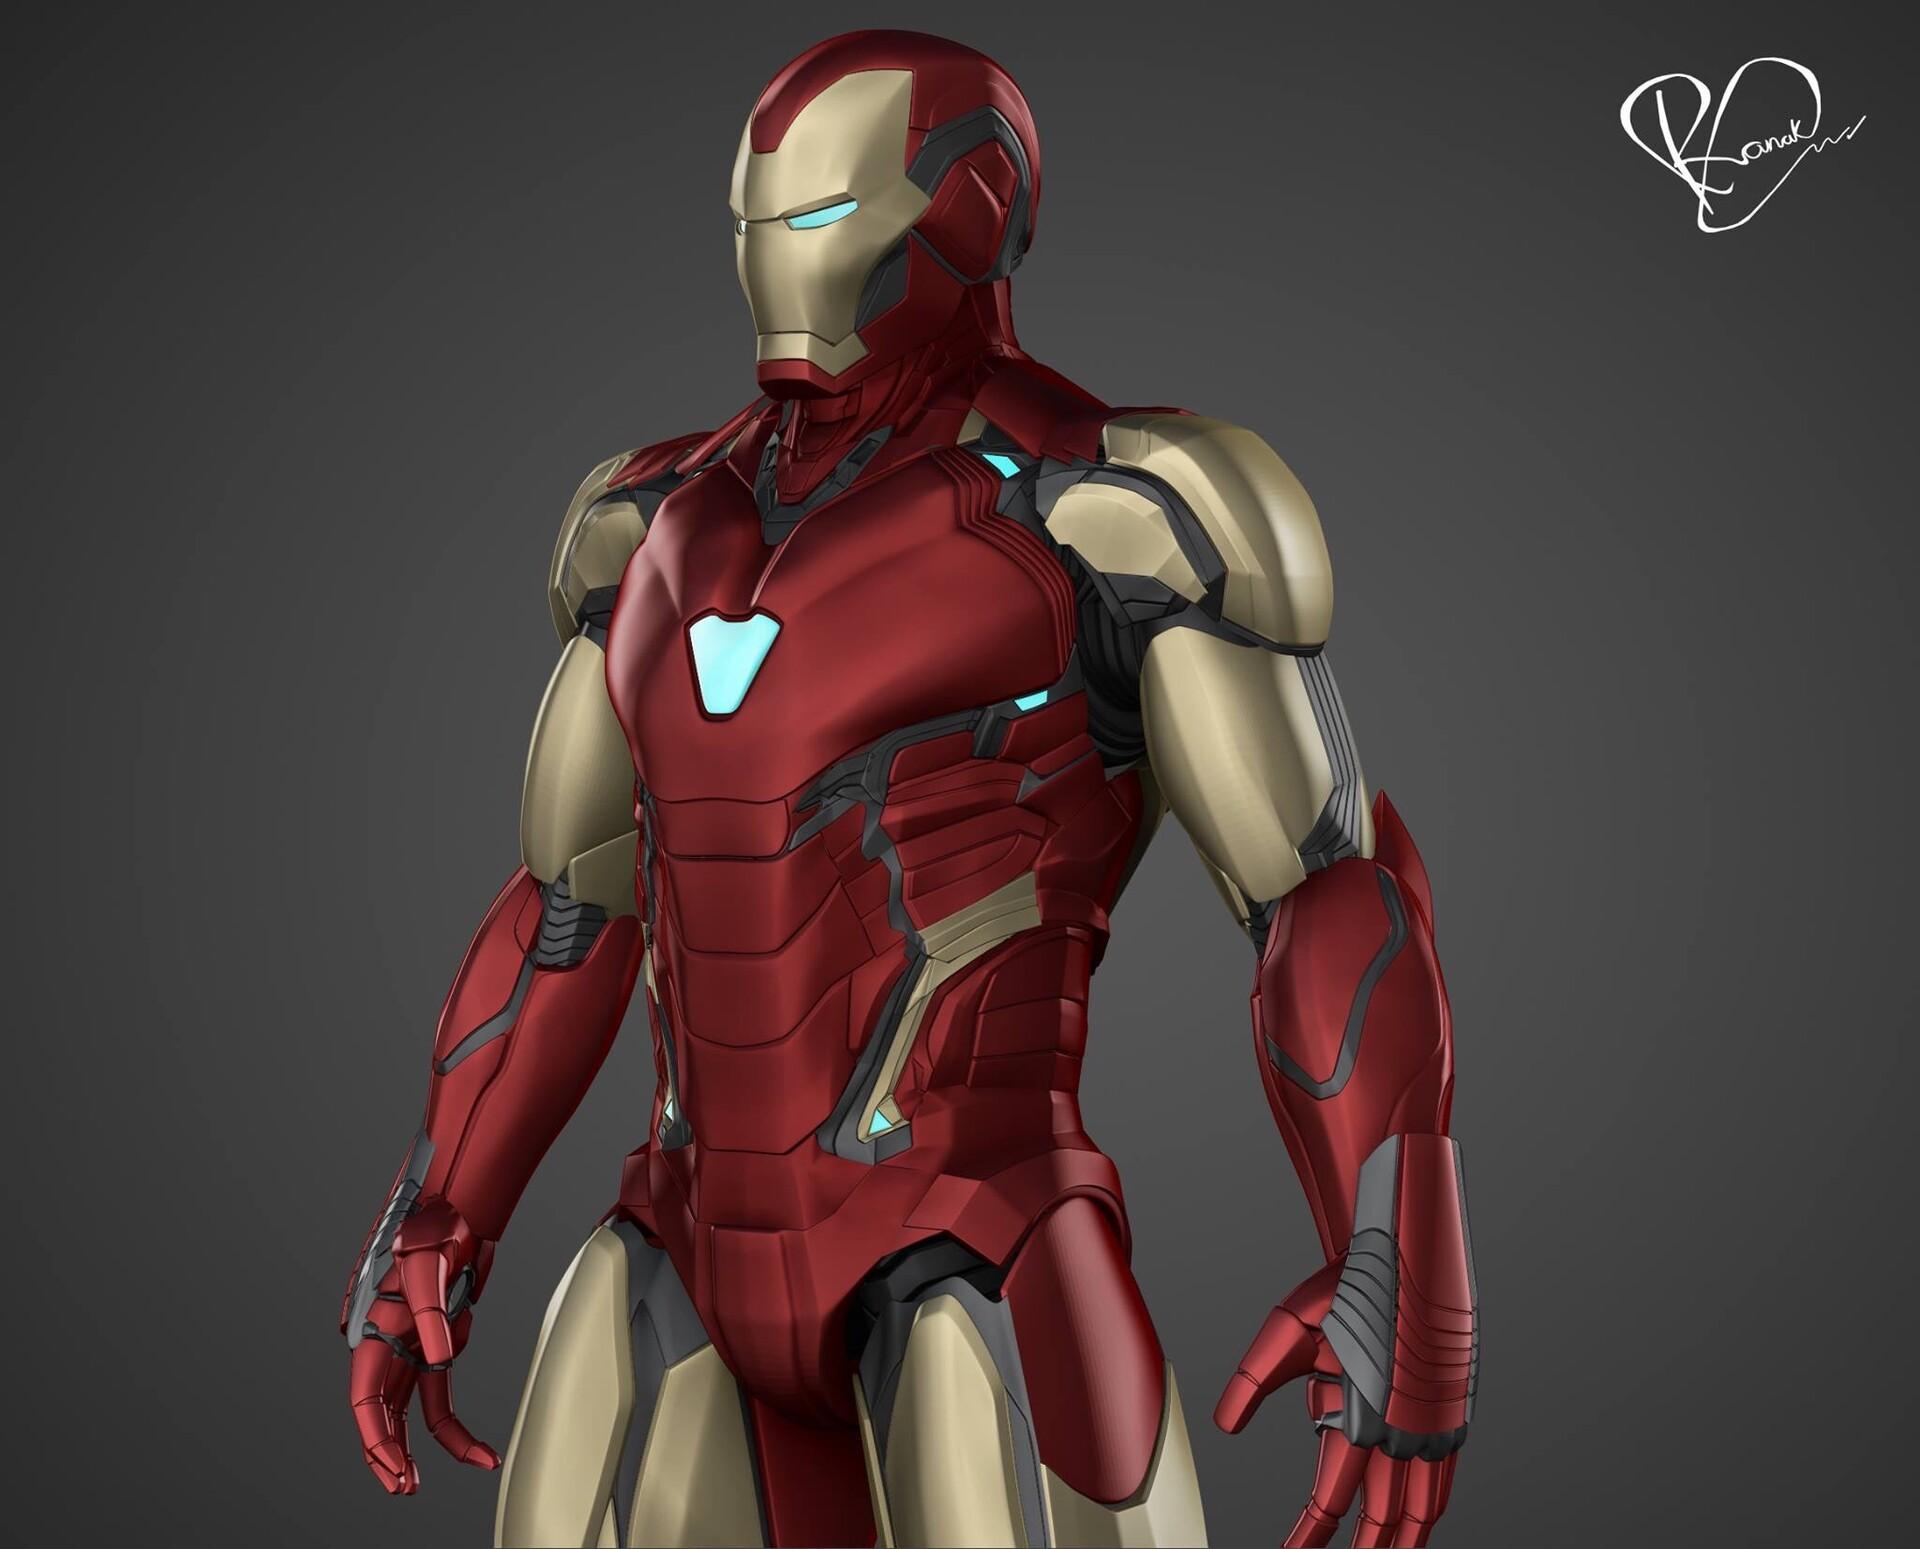 Hot Toys Avengers Infinity War Iron Man Mark 50 The Toyark News